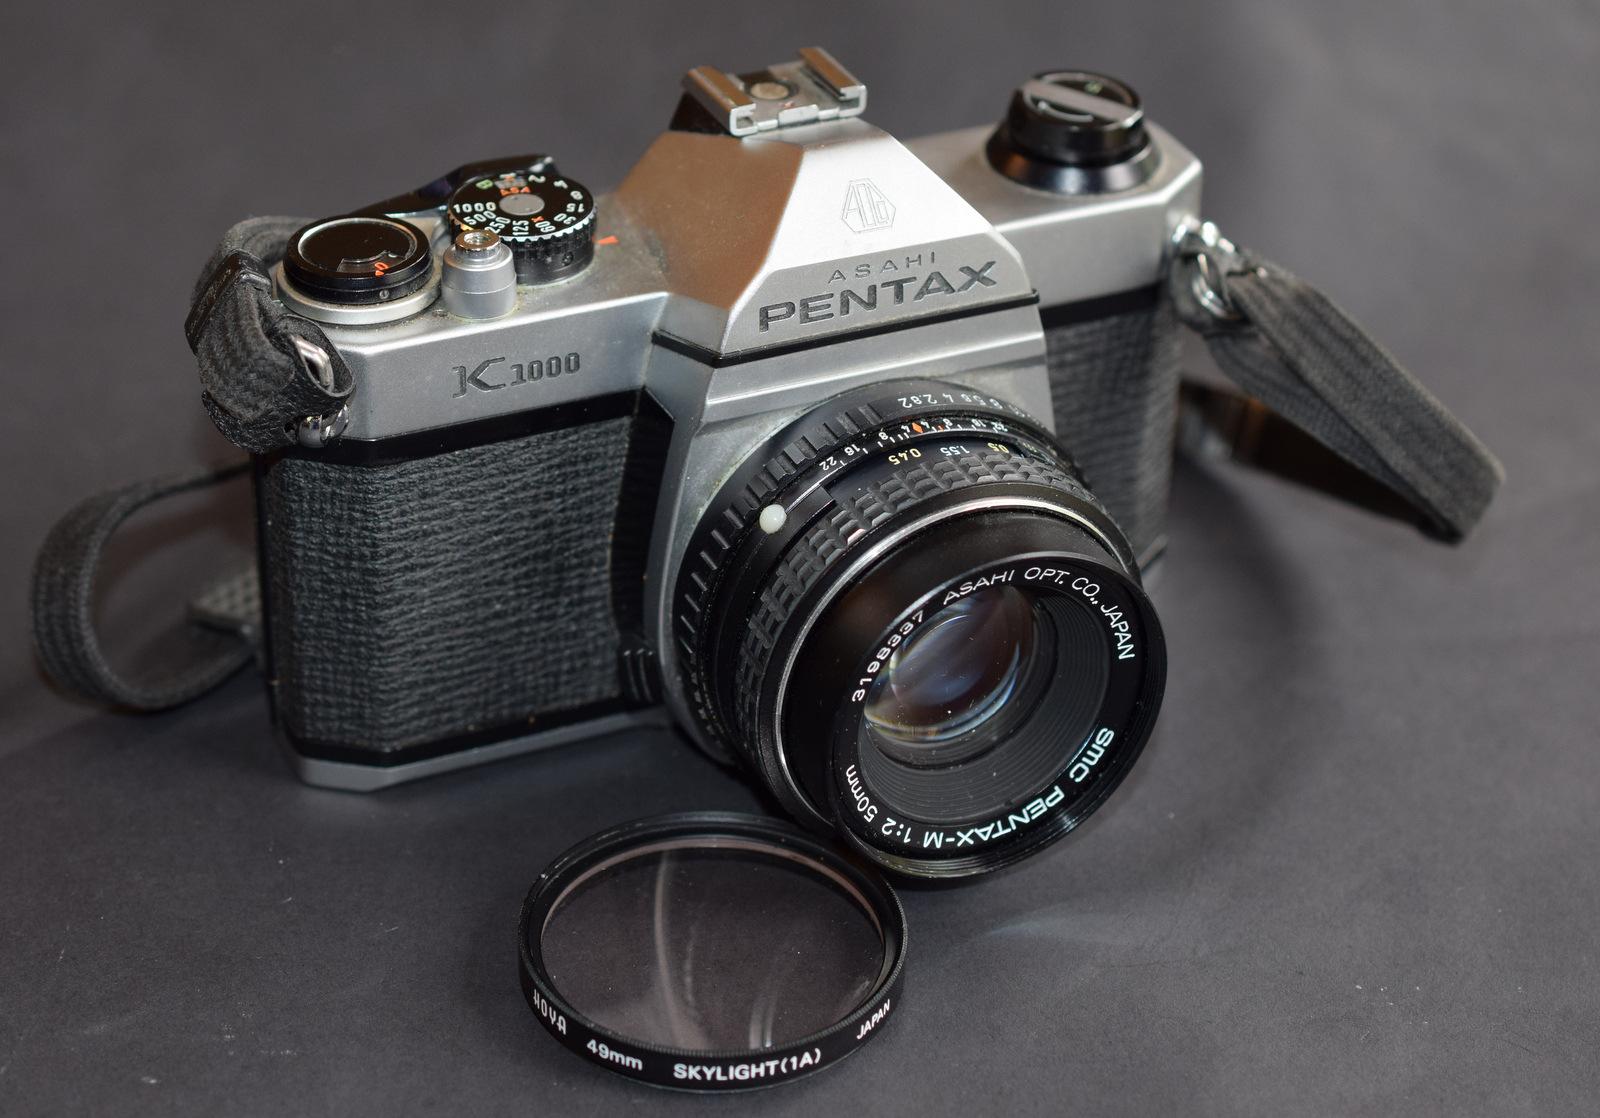 Lot 25 - Rare Asahi Penta K1000 With Lens